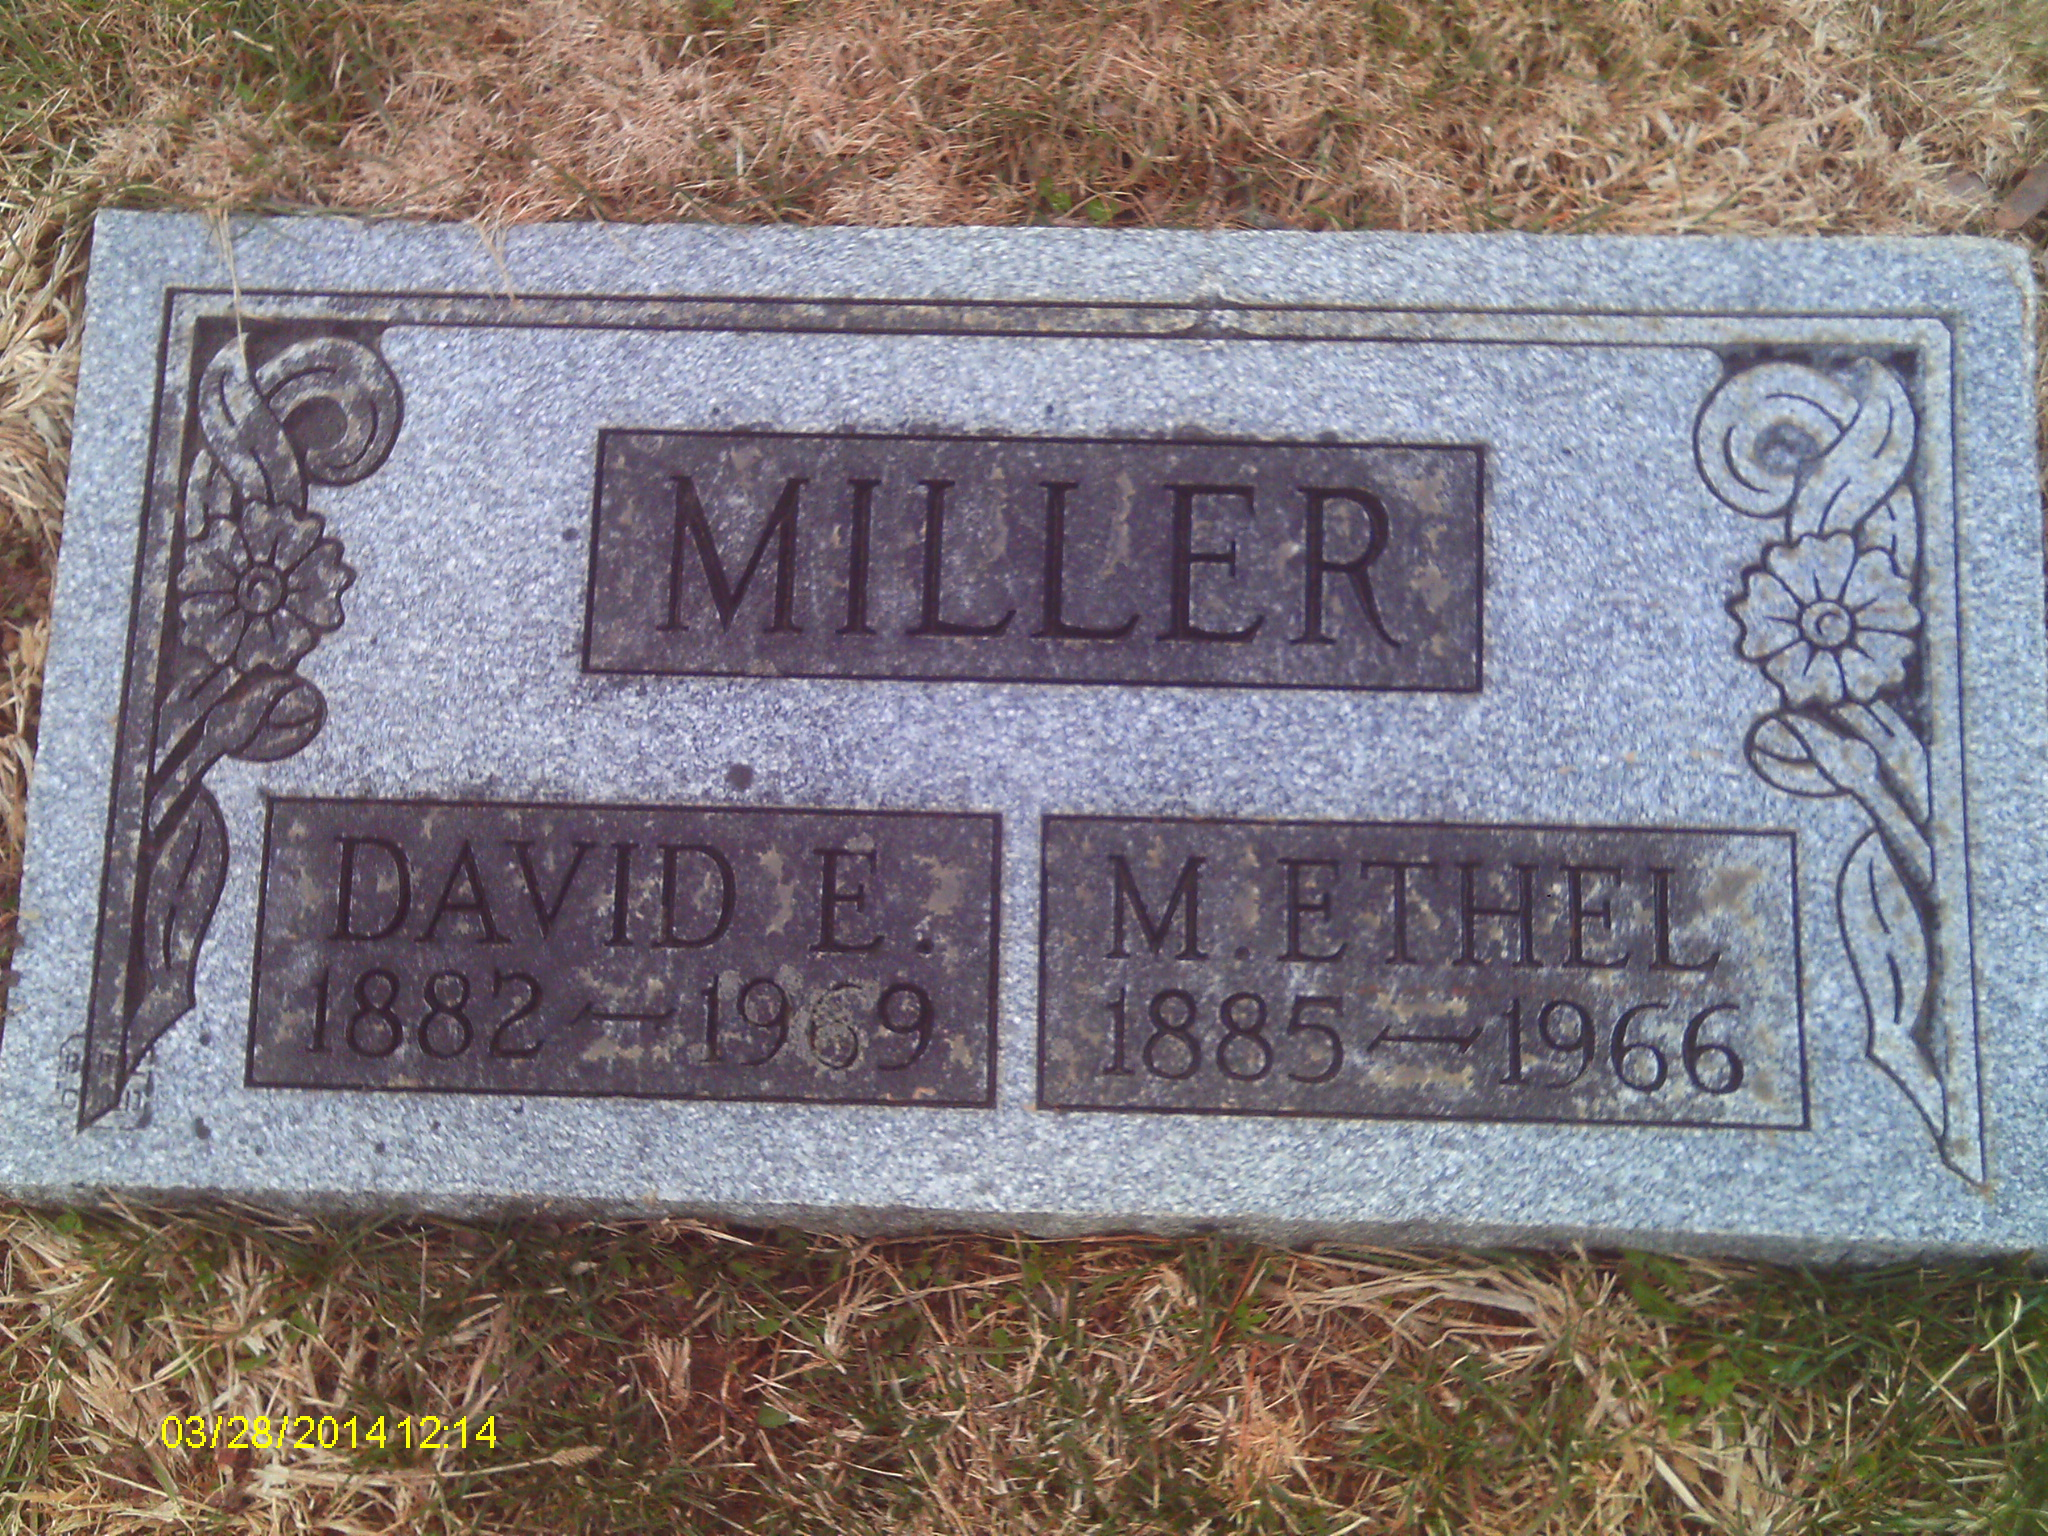 Mary Ethel Miller